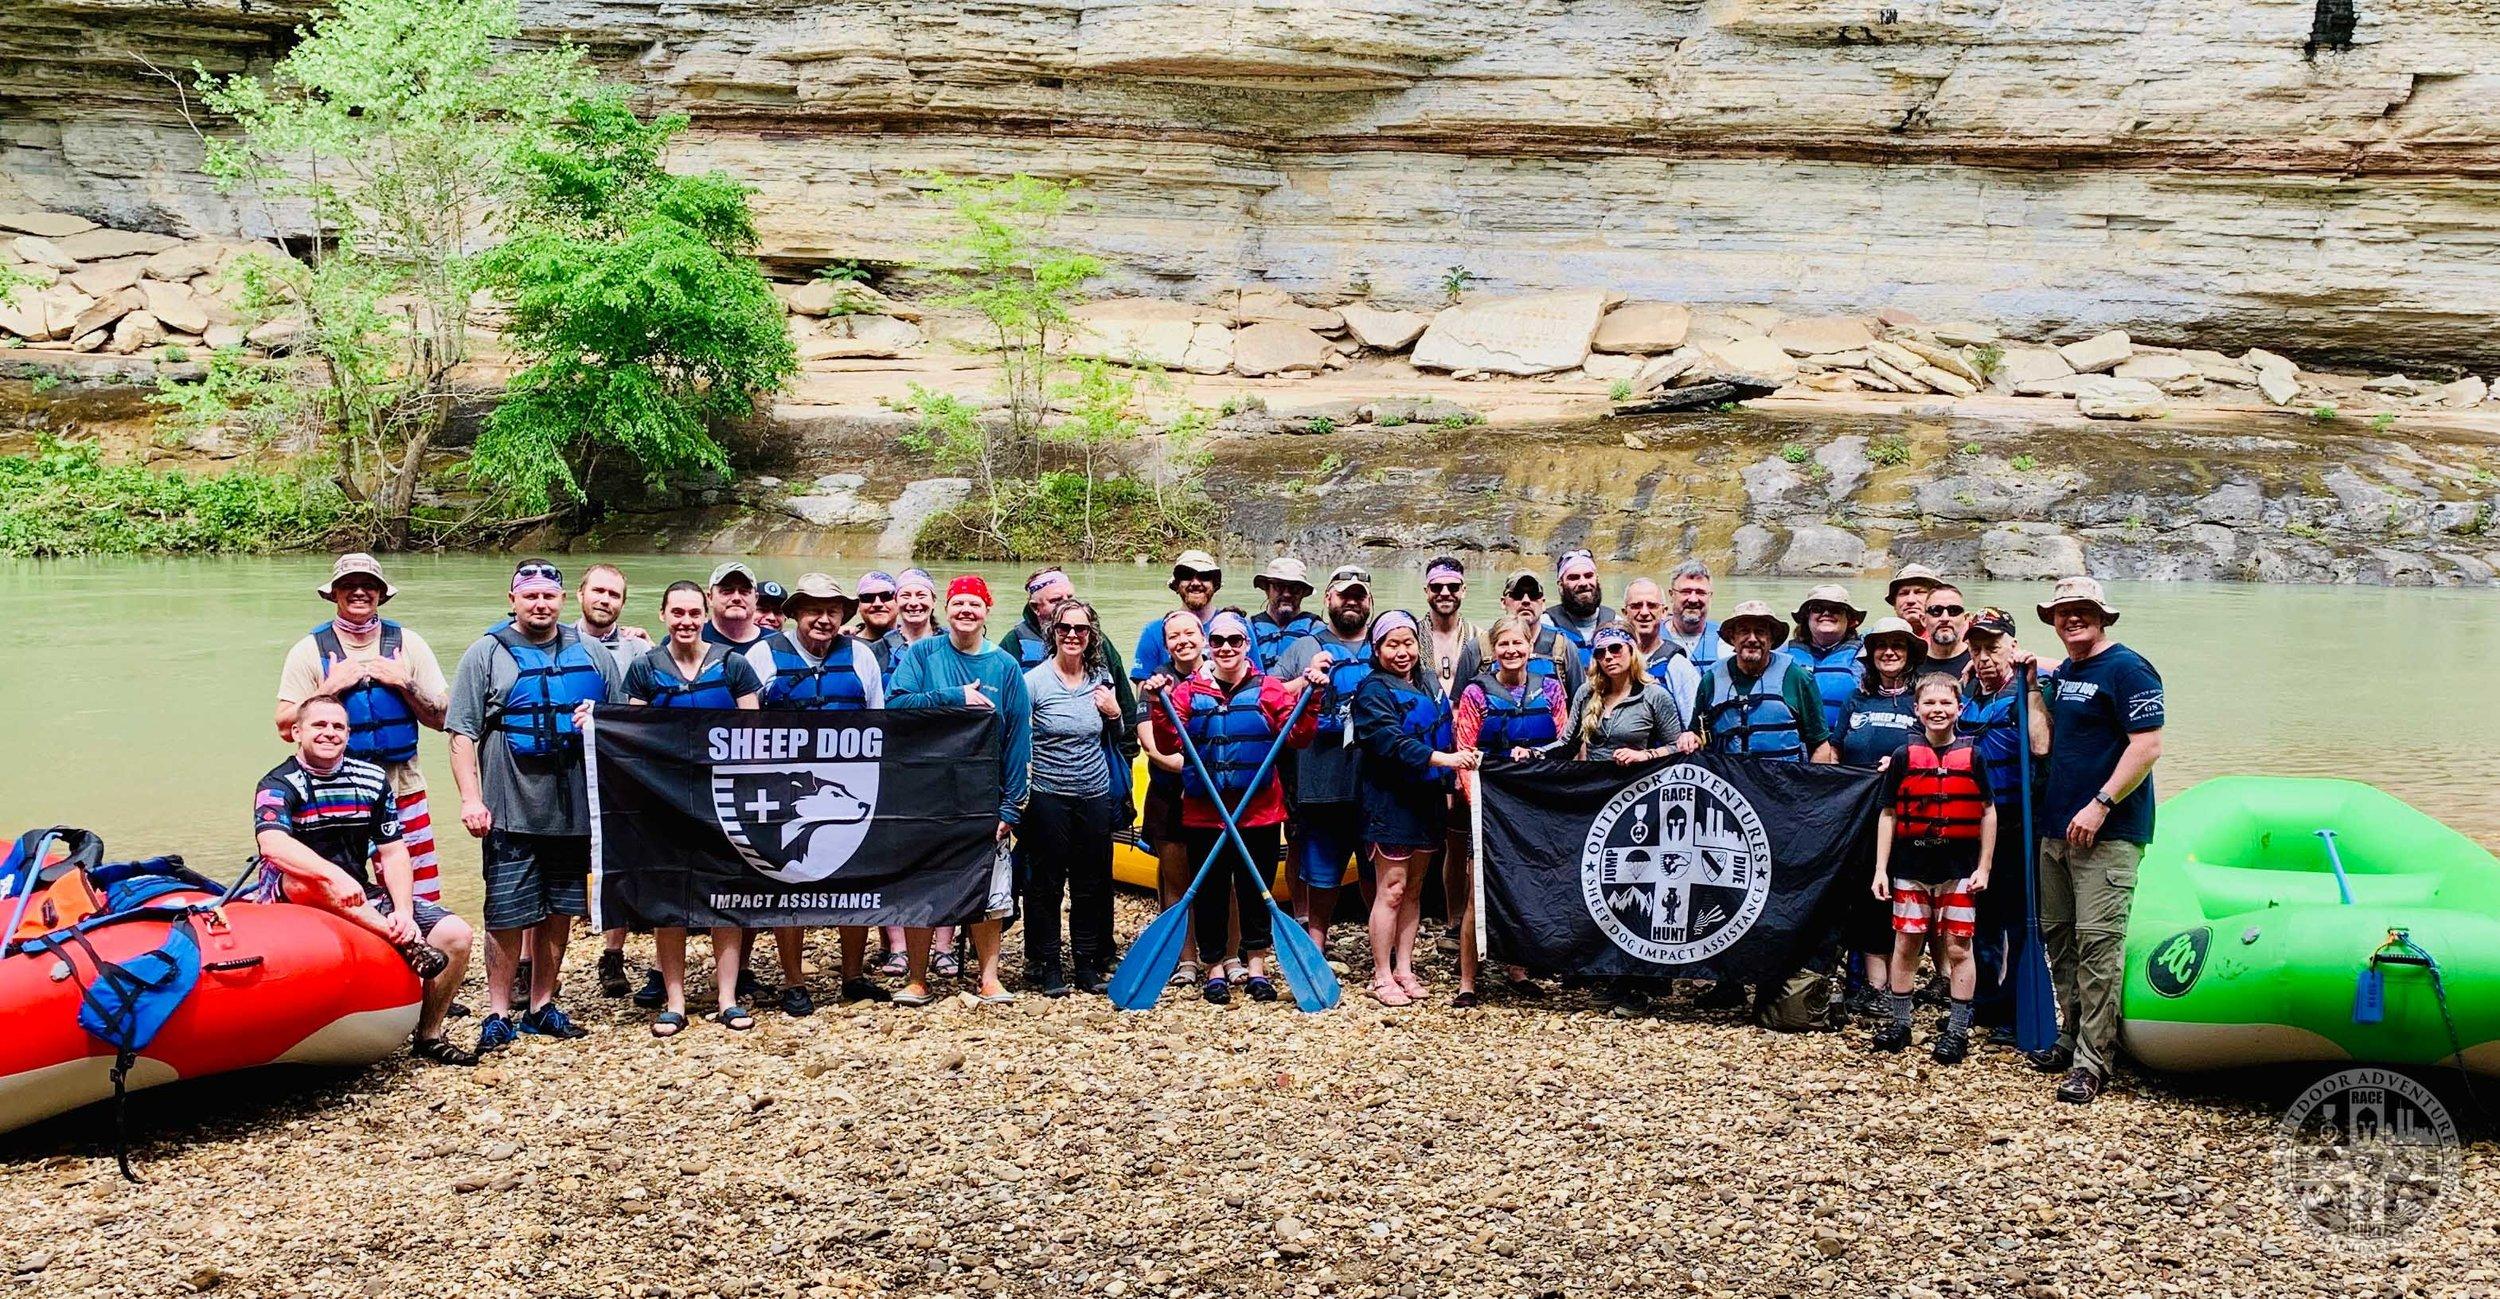 SDIA OA Buffalo group flags rafts 04MAY2019 wm.jpg